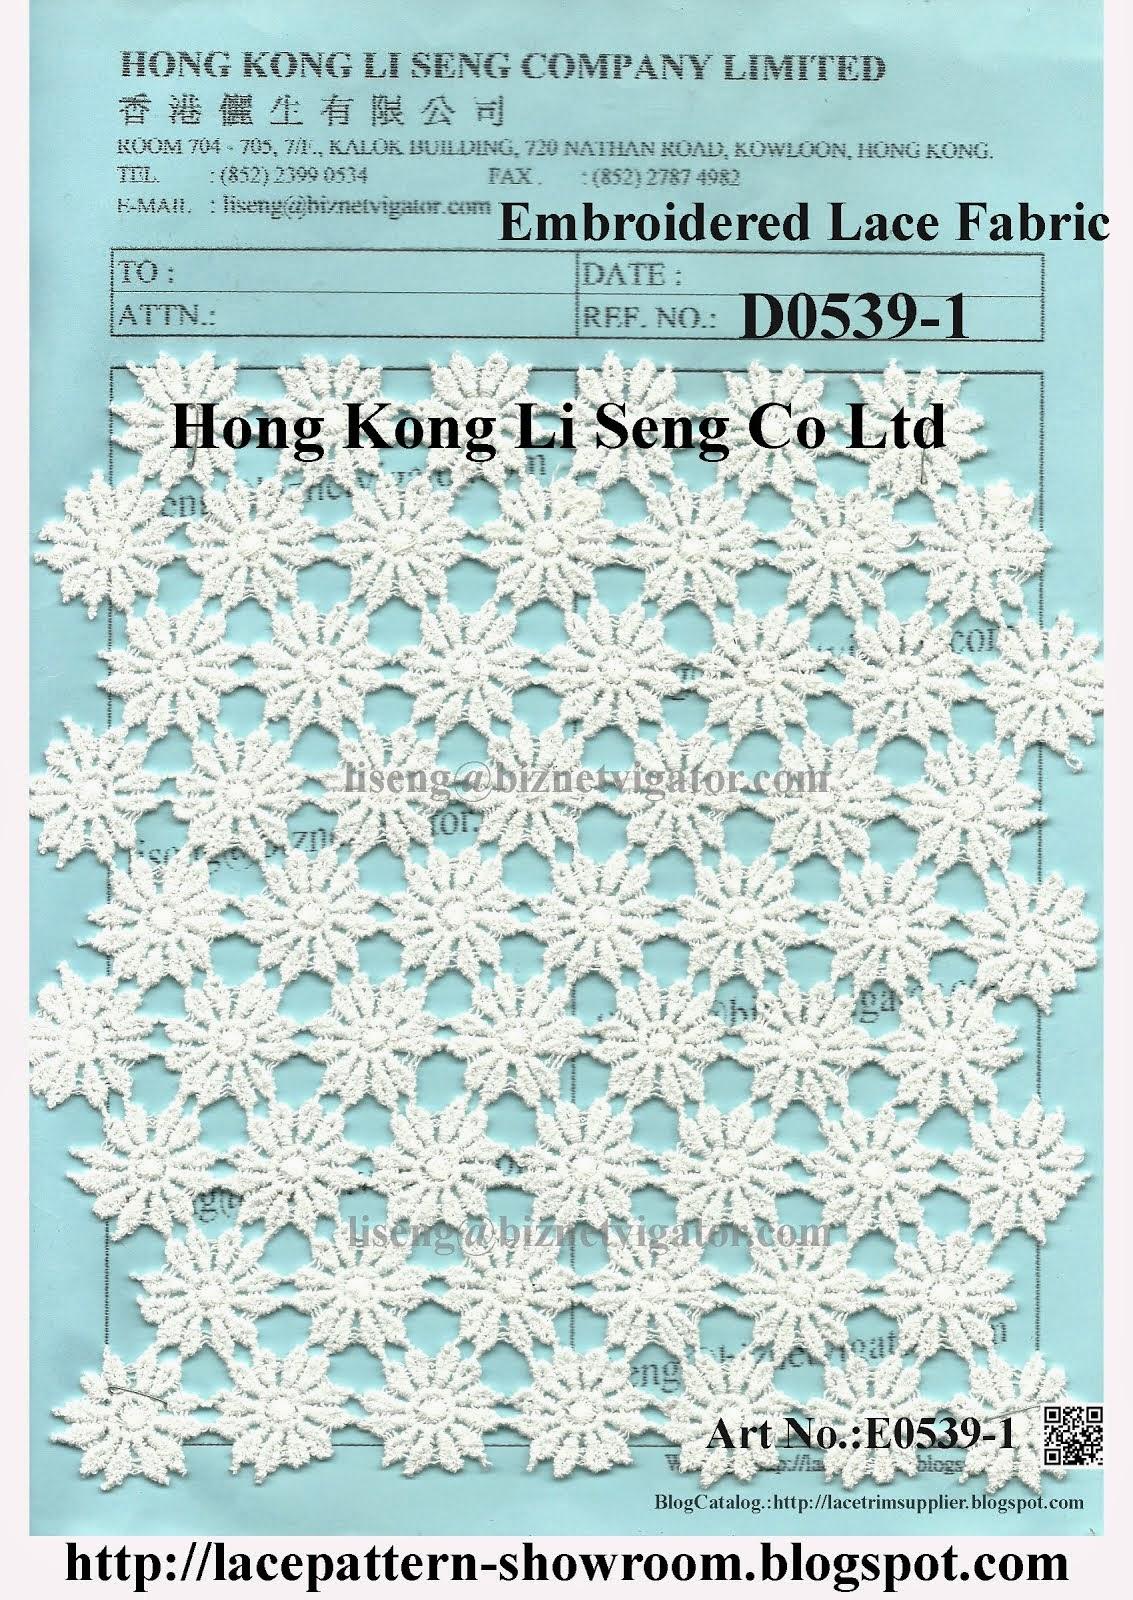 Embroidered Lace Fabric Factory - Hong Kong Li Seng Co Ltd